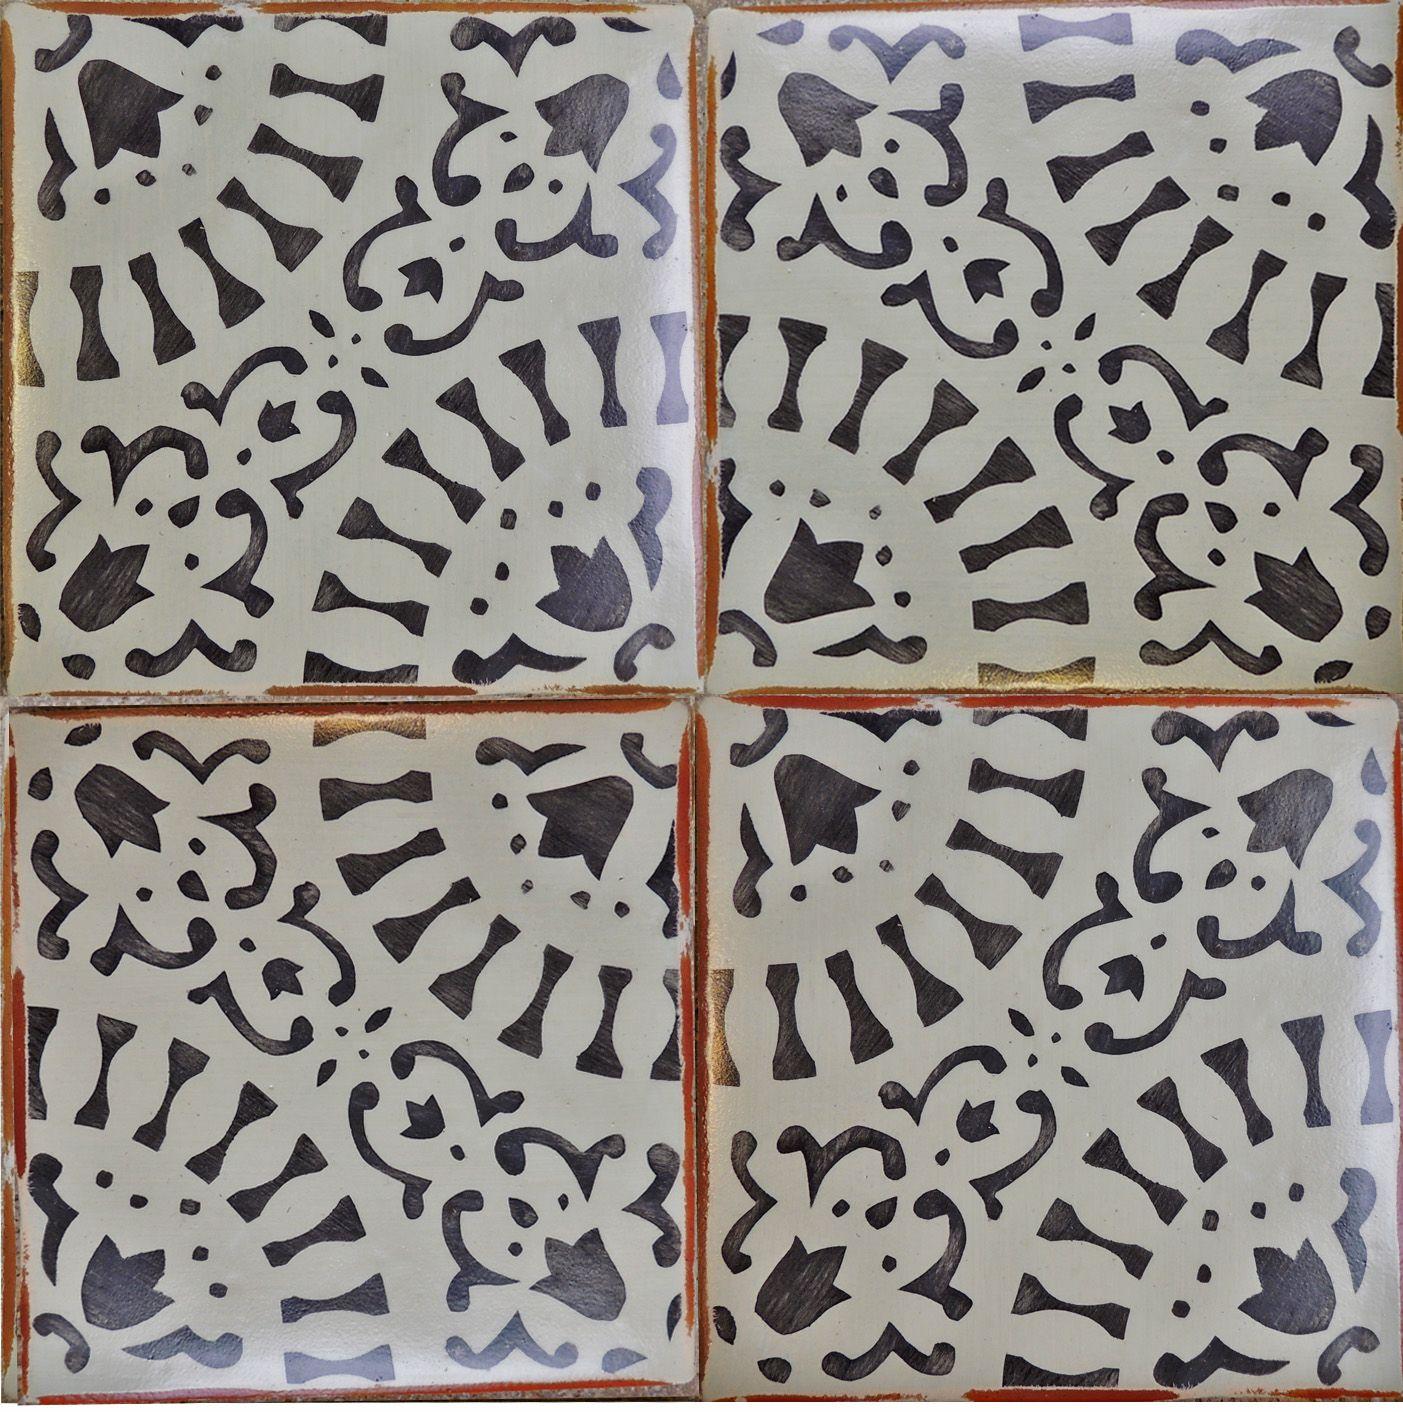 Robins Kitchen Garden City Tabarka Studio Artisan Tiles Paris Metro 14 In Charcoal On Robins